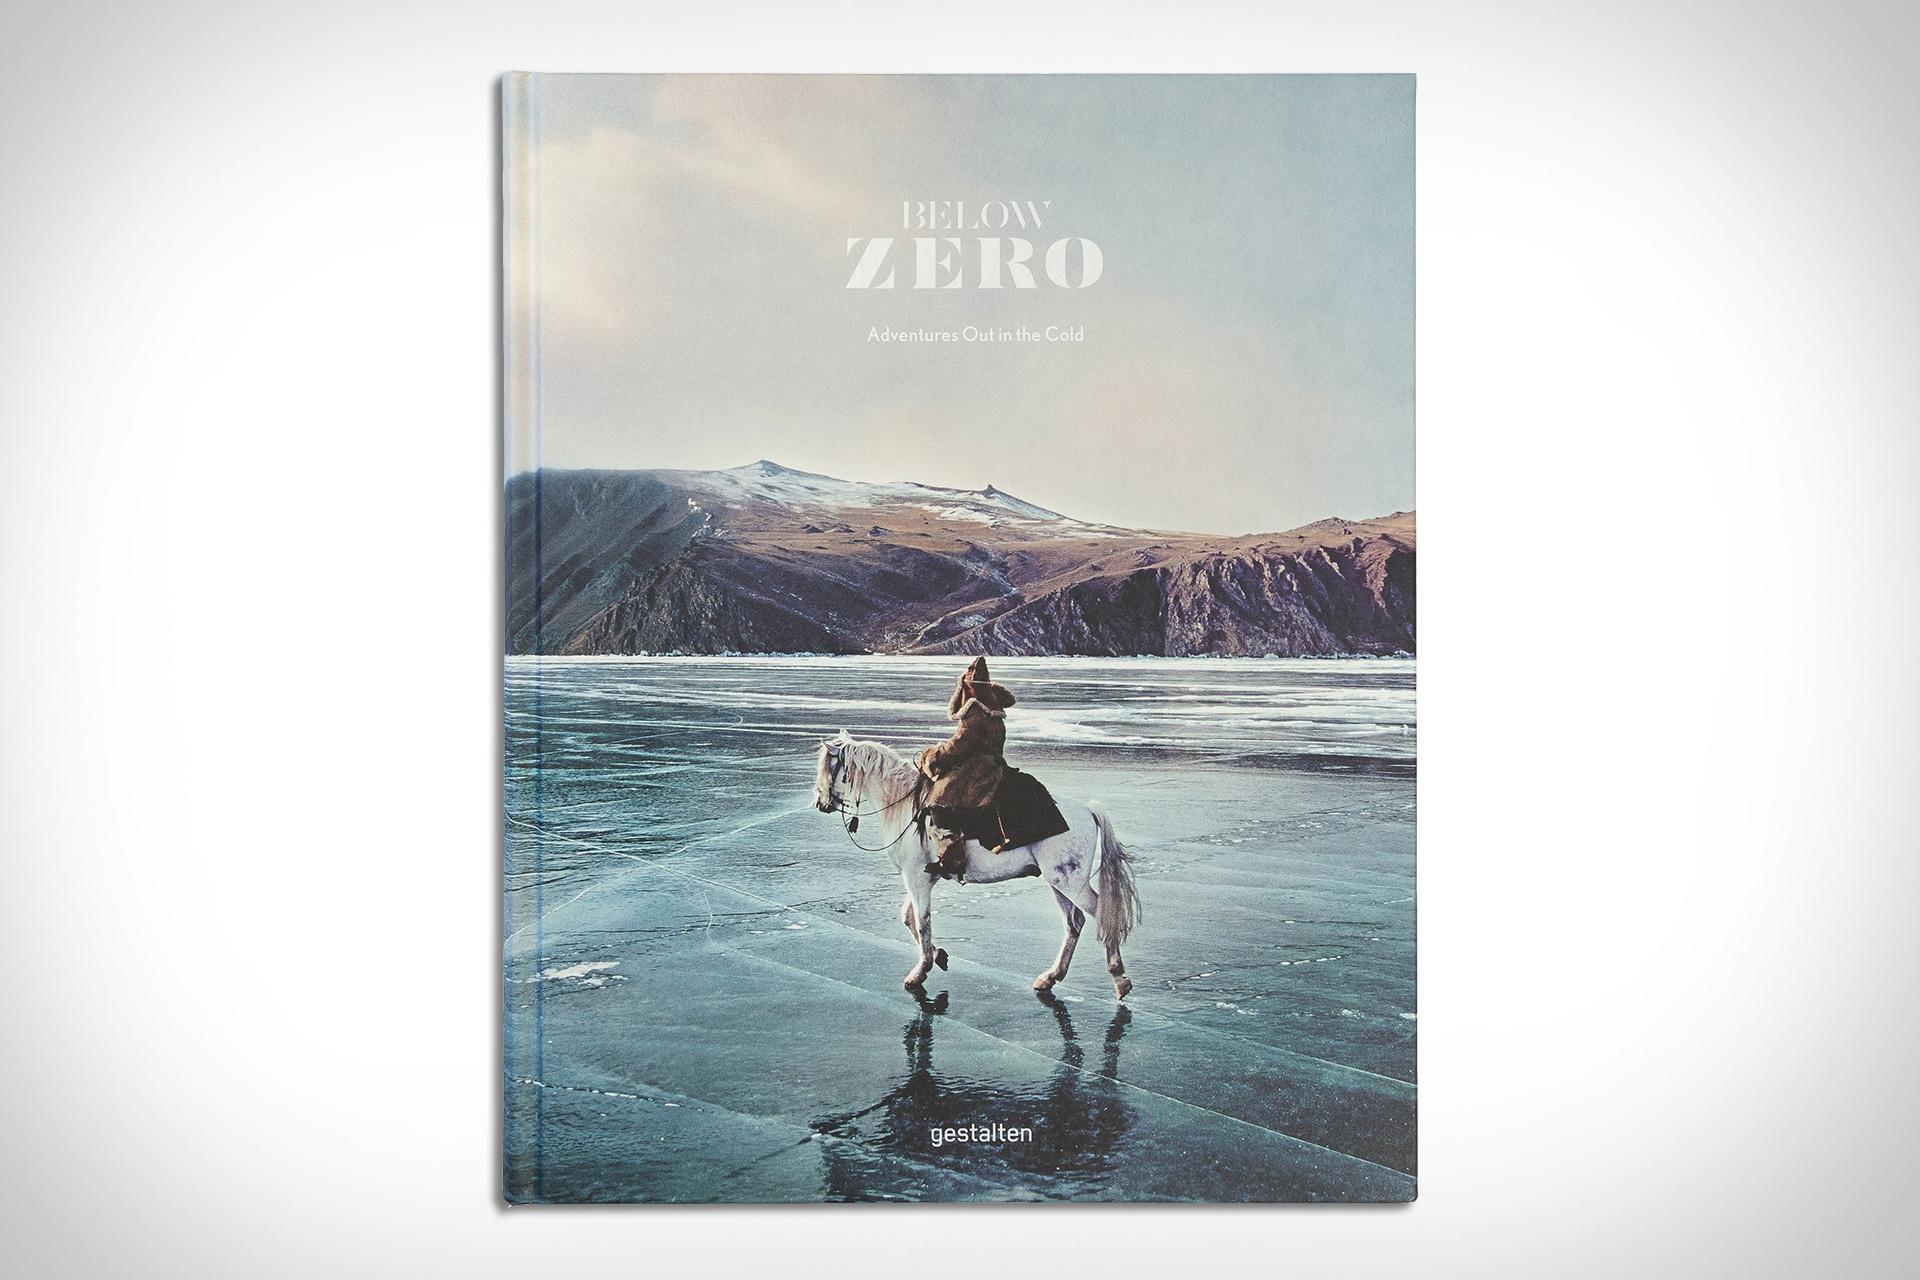 Le Livre Below Zero